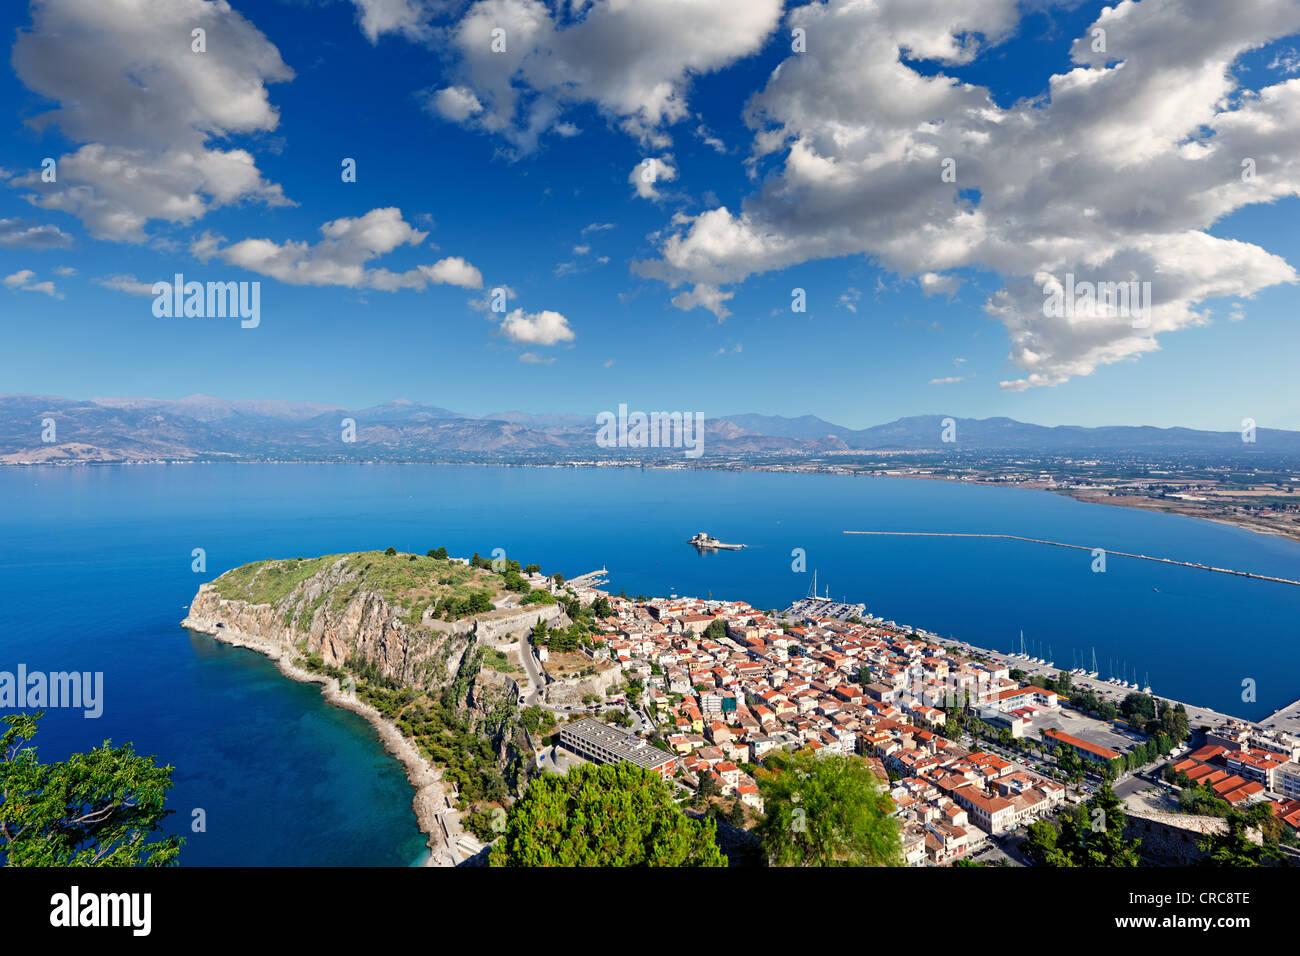 Acronafplia in the bay of Nafplio, Greece Stock Photo